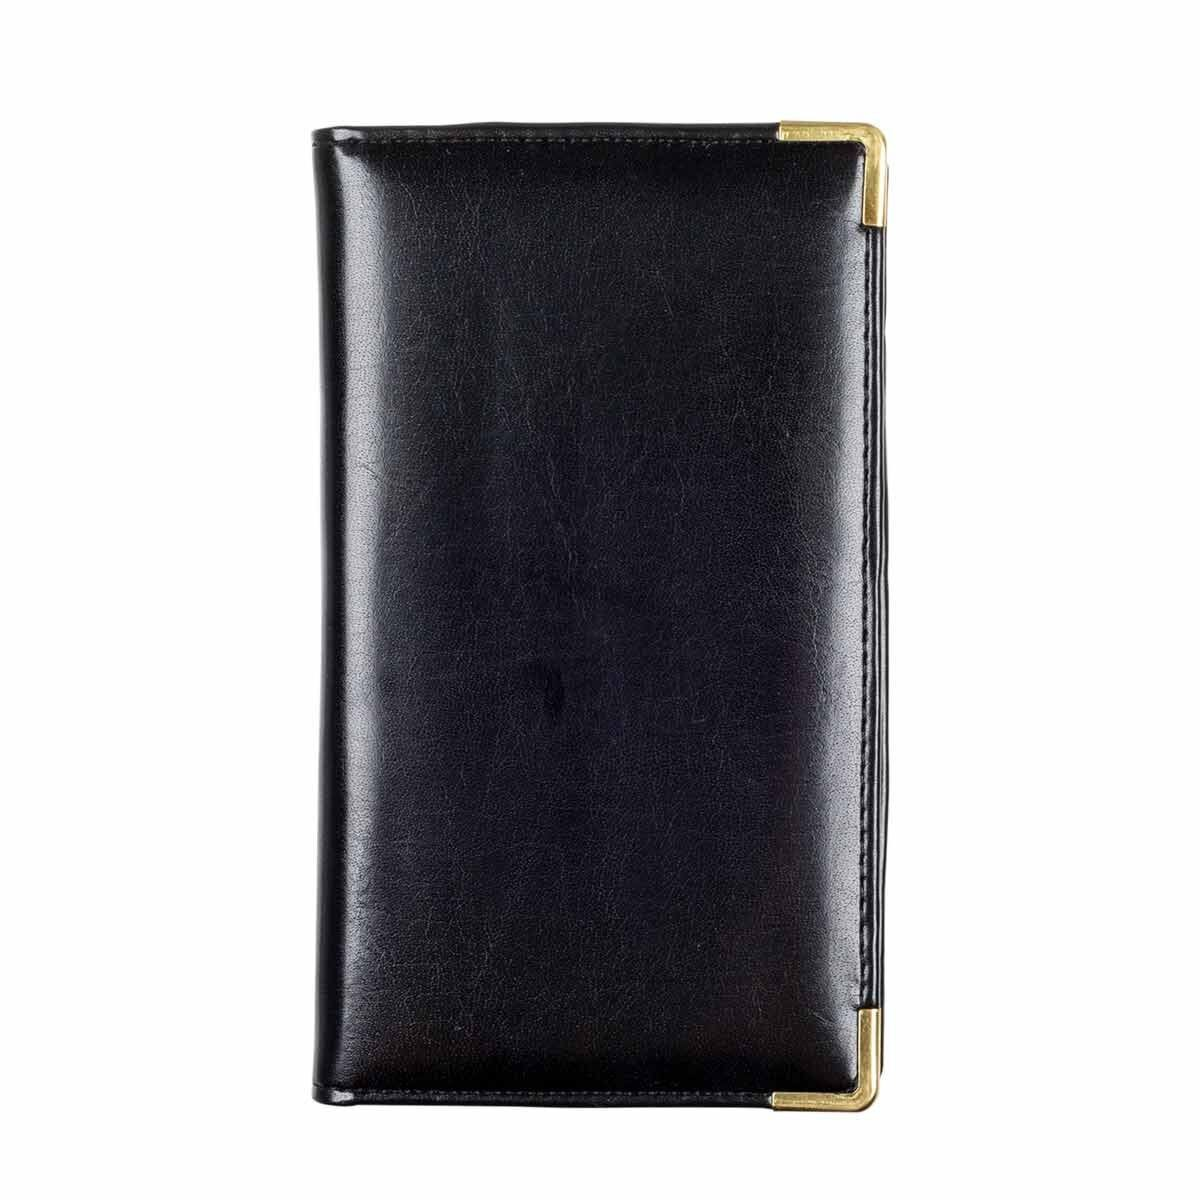 Ryman D10 Wallet Diary Week to View Slim 2021